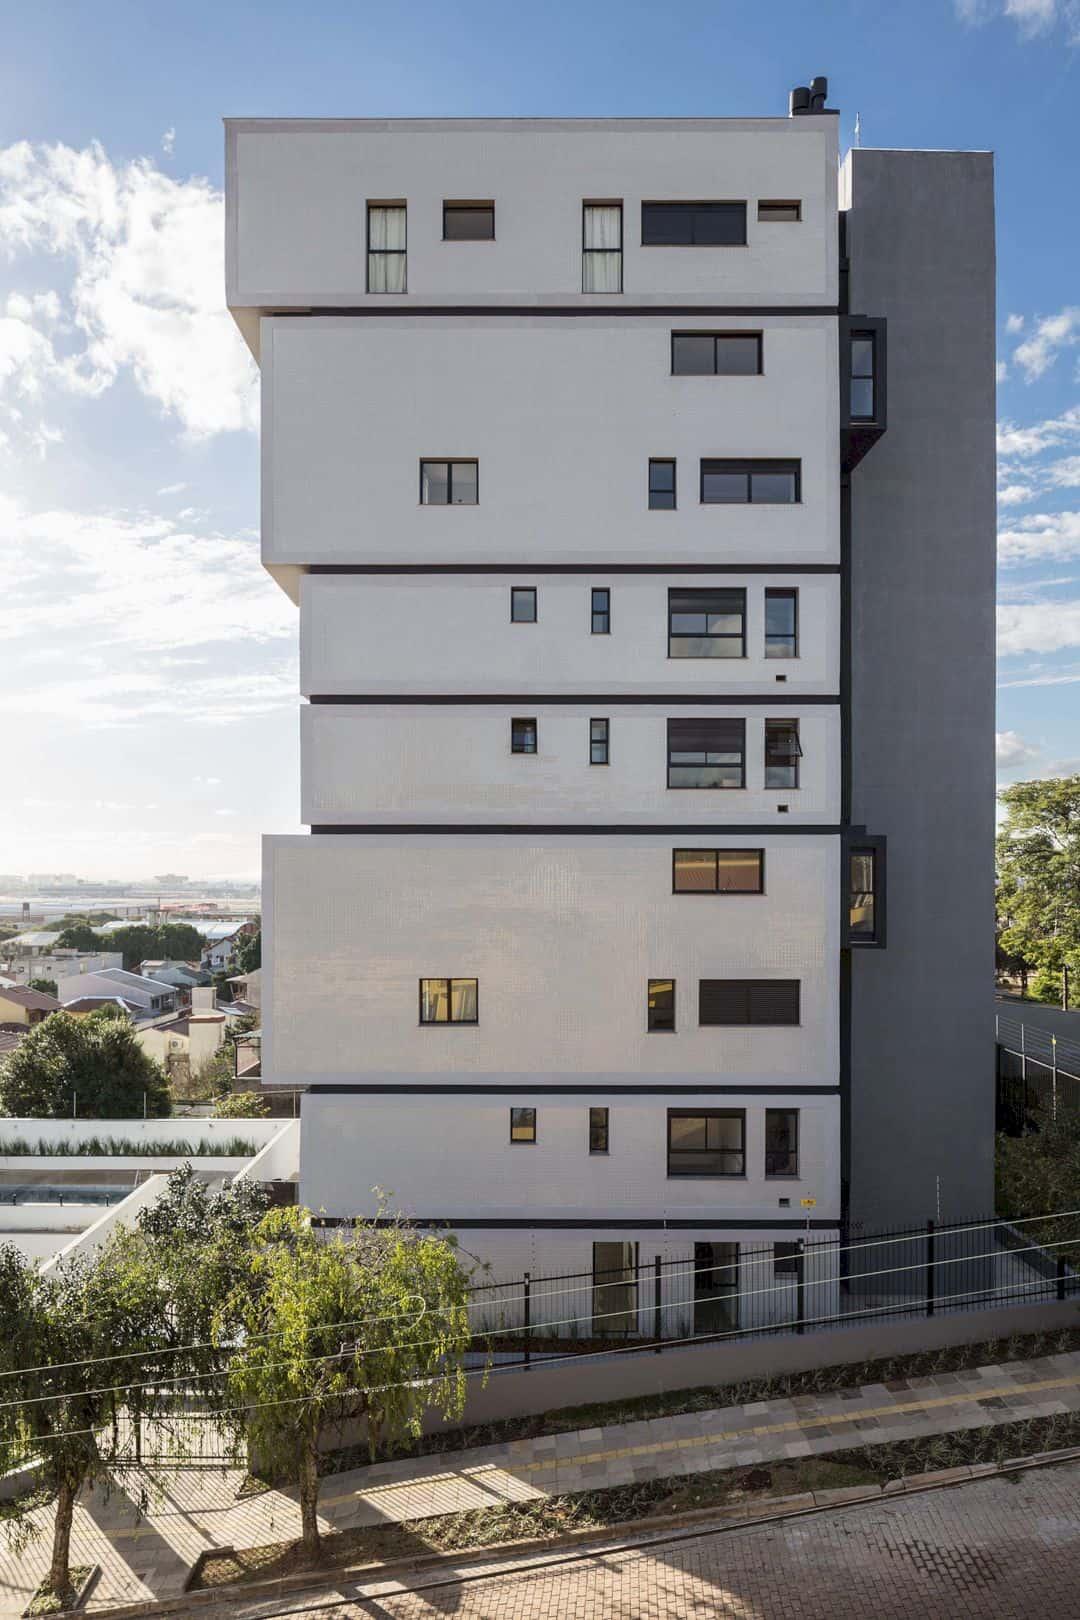 Fernando Abbott 866 A High Rise Residential Building In Porto Alegre 2